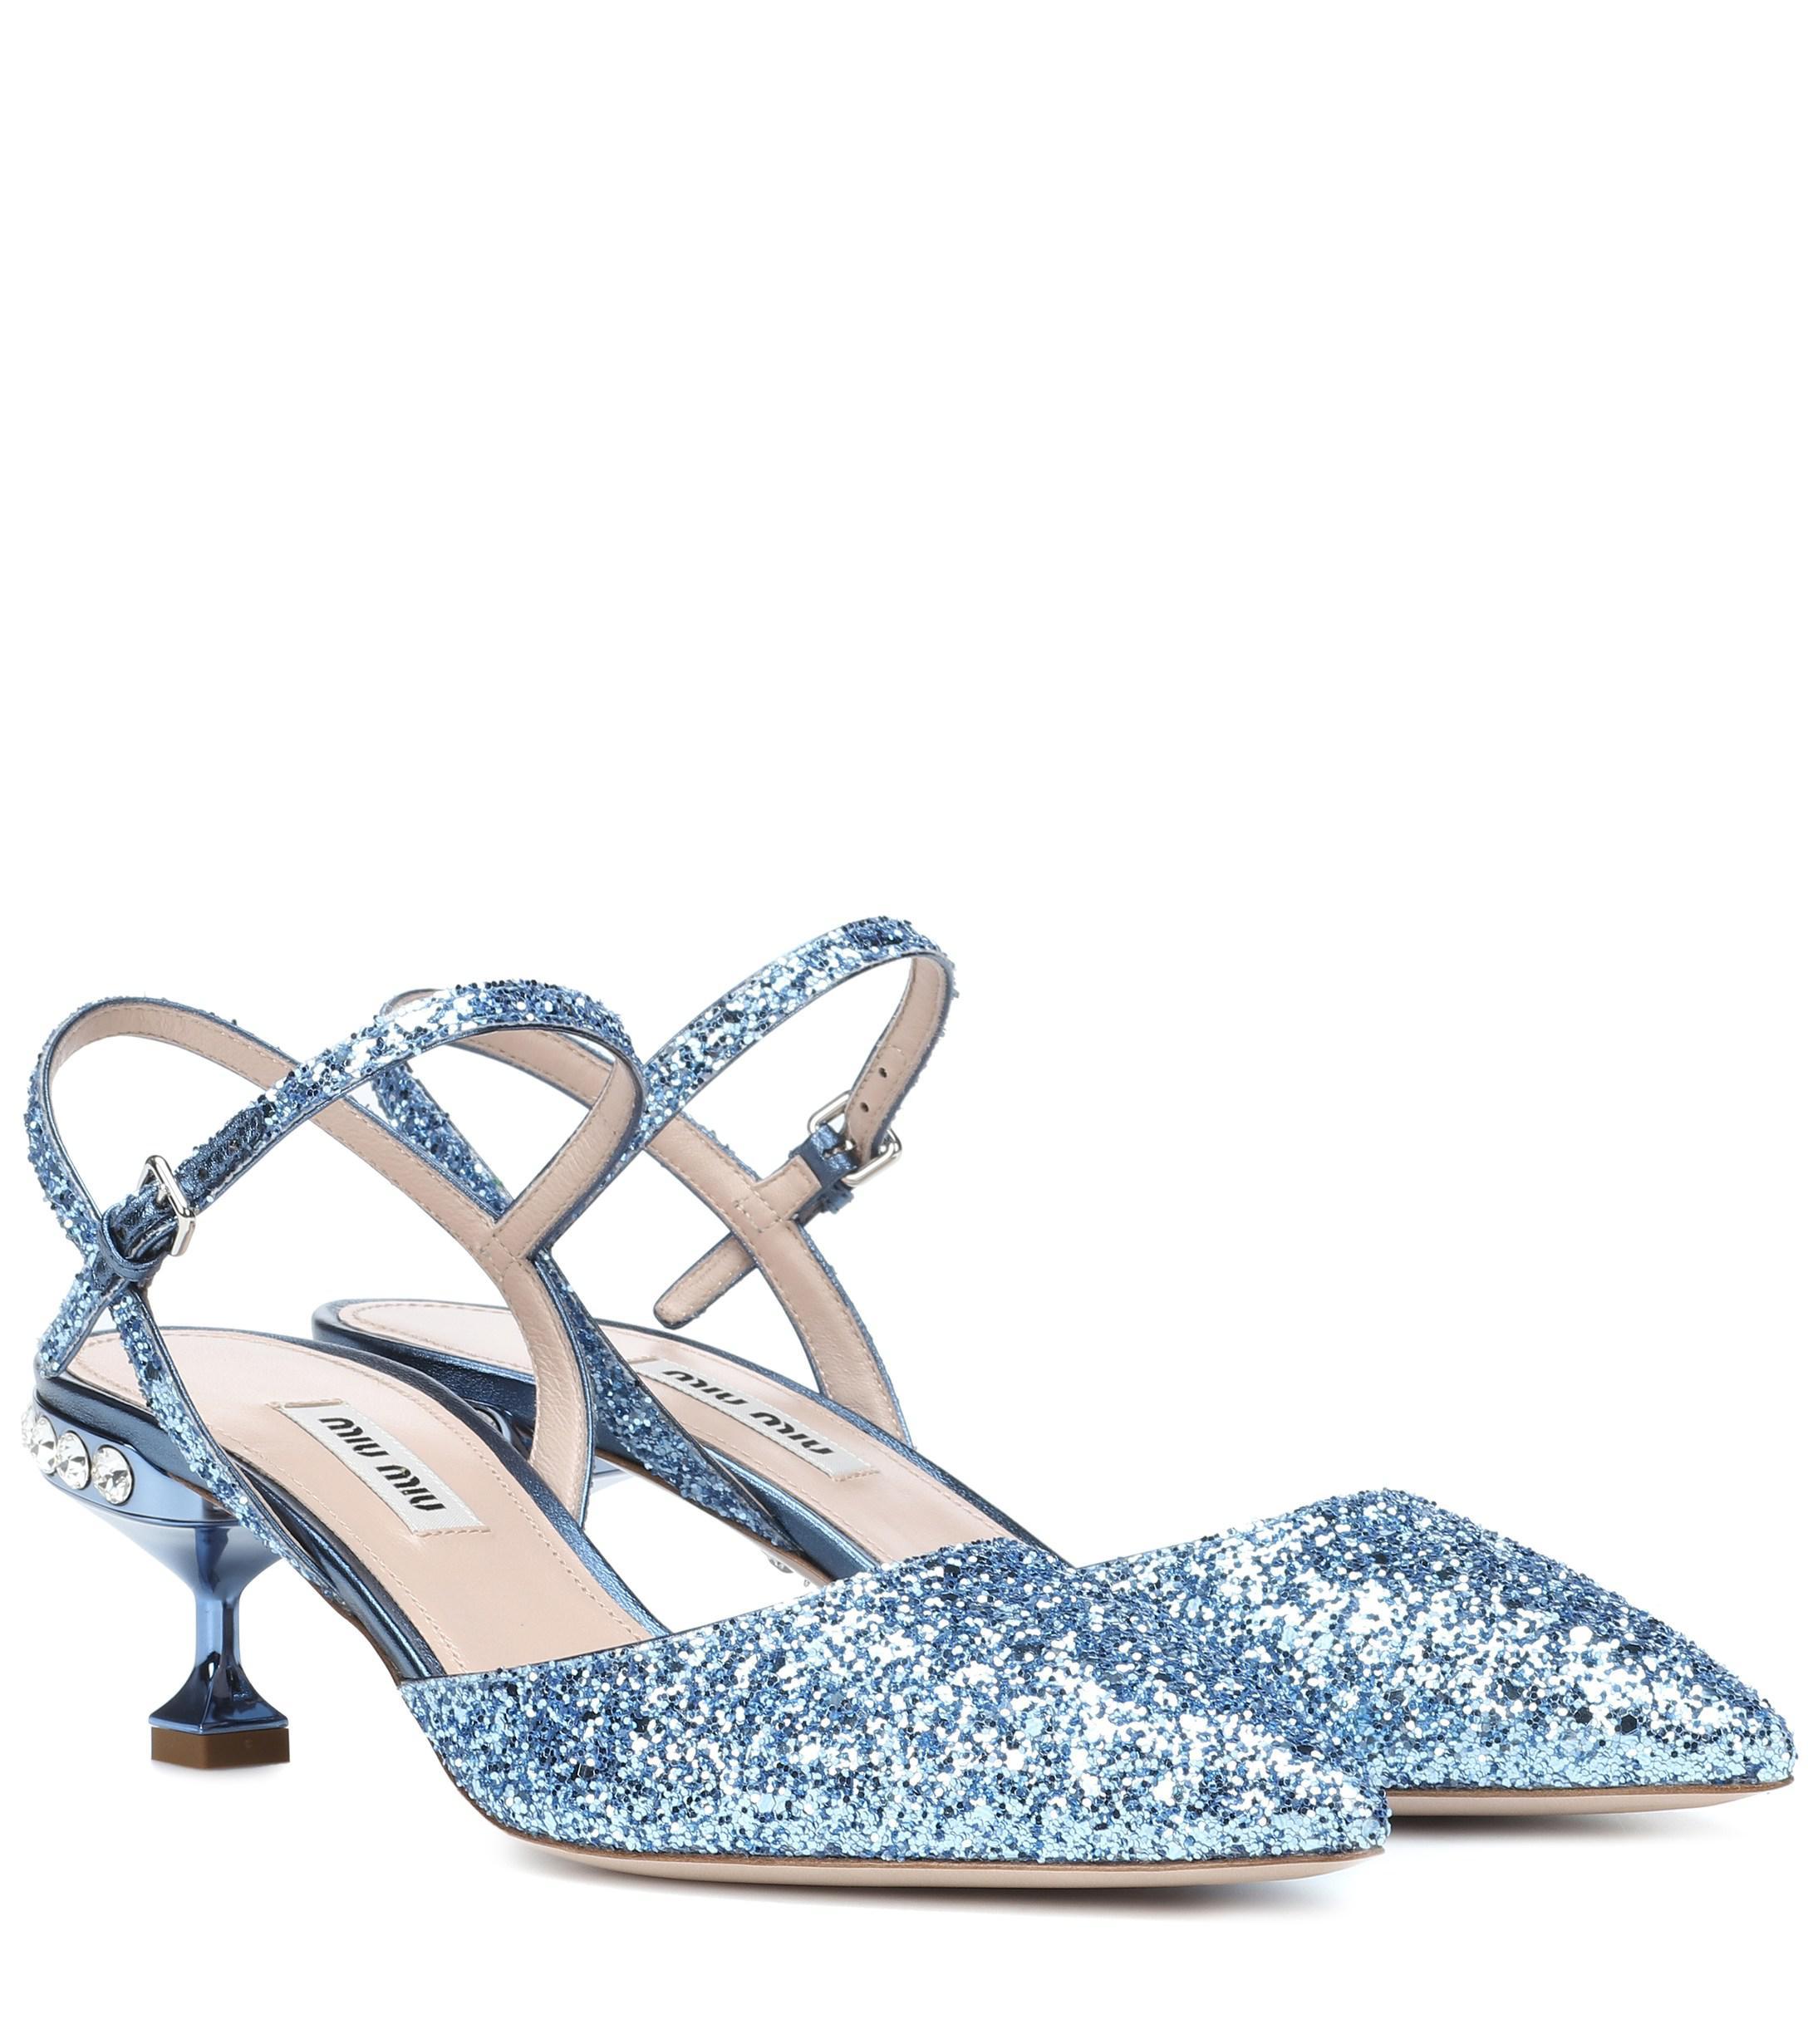 ac909fd6e05d Miu Miu. Women s Blue Glitter Slingback Pumps.  790 +  25.00 shipping ...